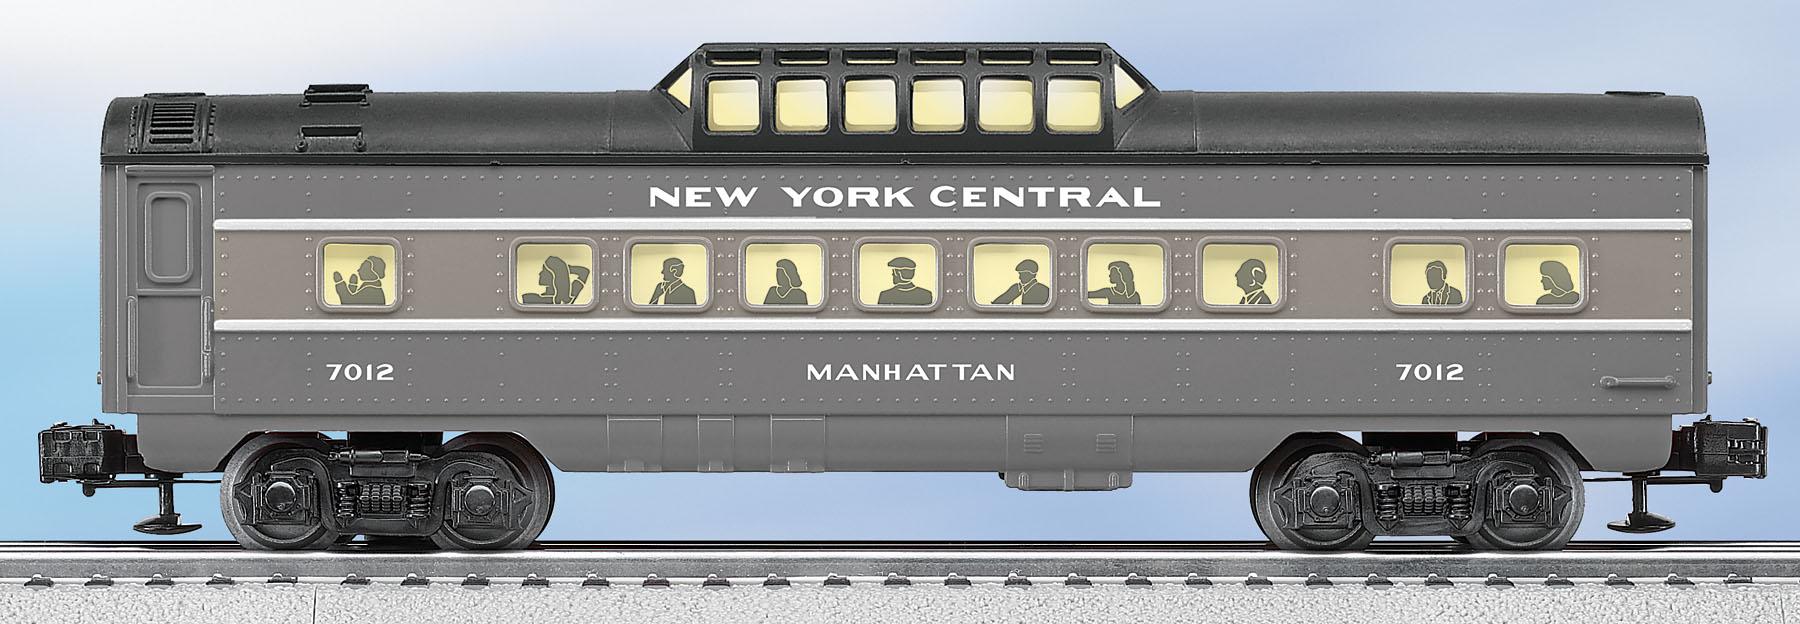 New York Central Flyer O27 Streamlined Vista Dome